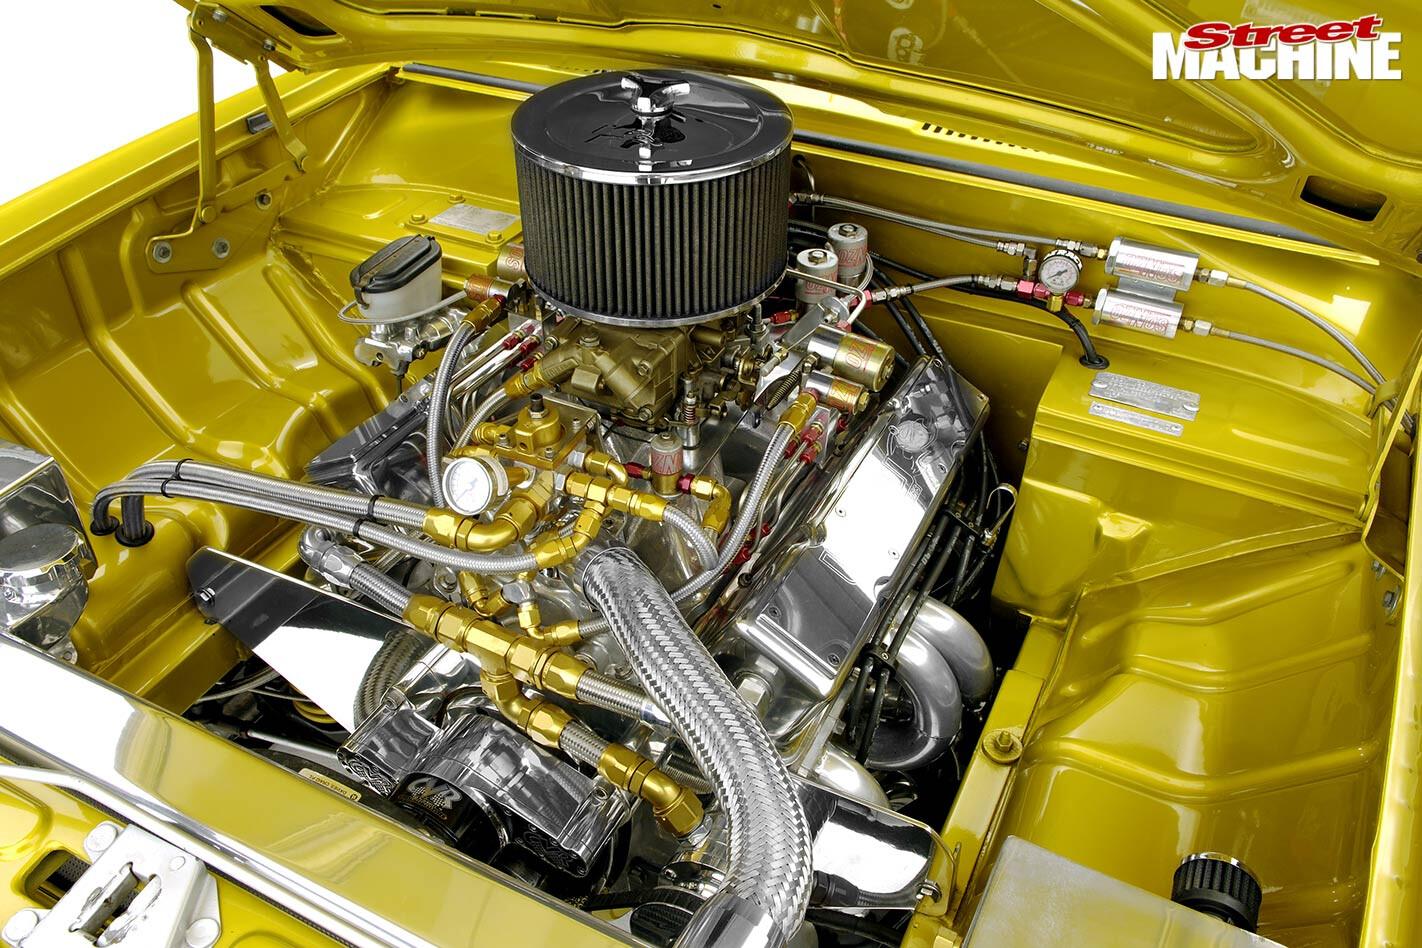 Holden HB Torana engine bay